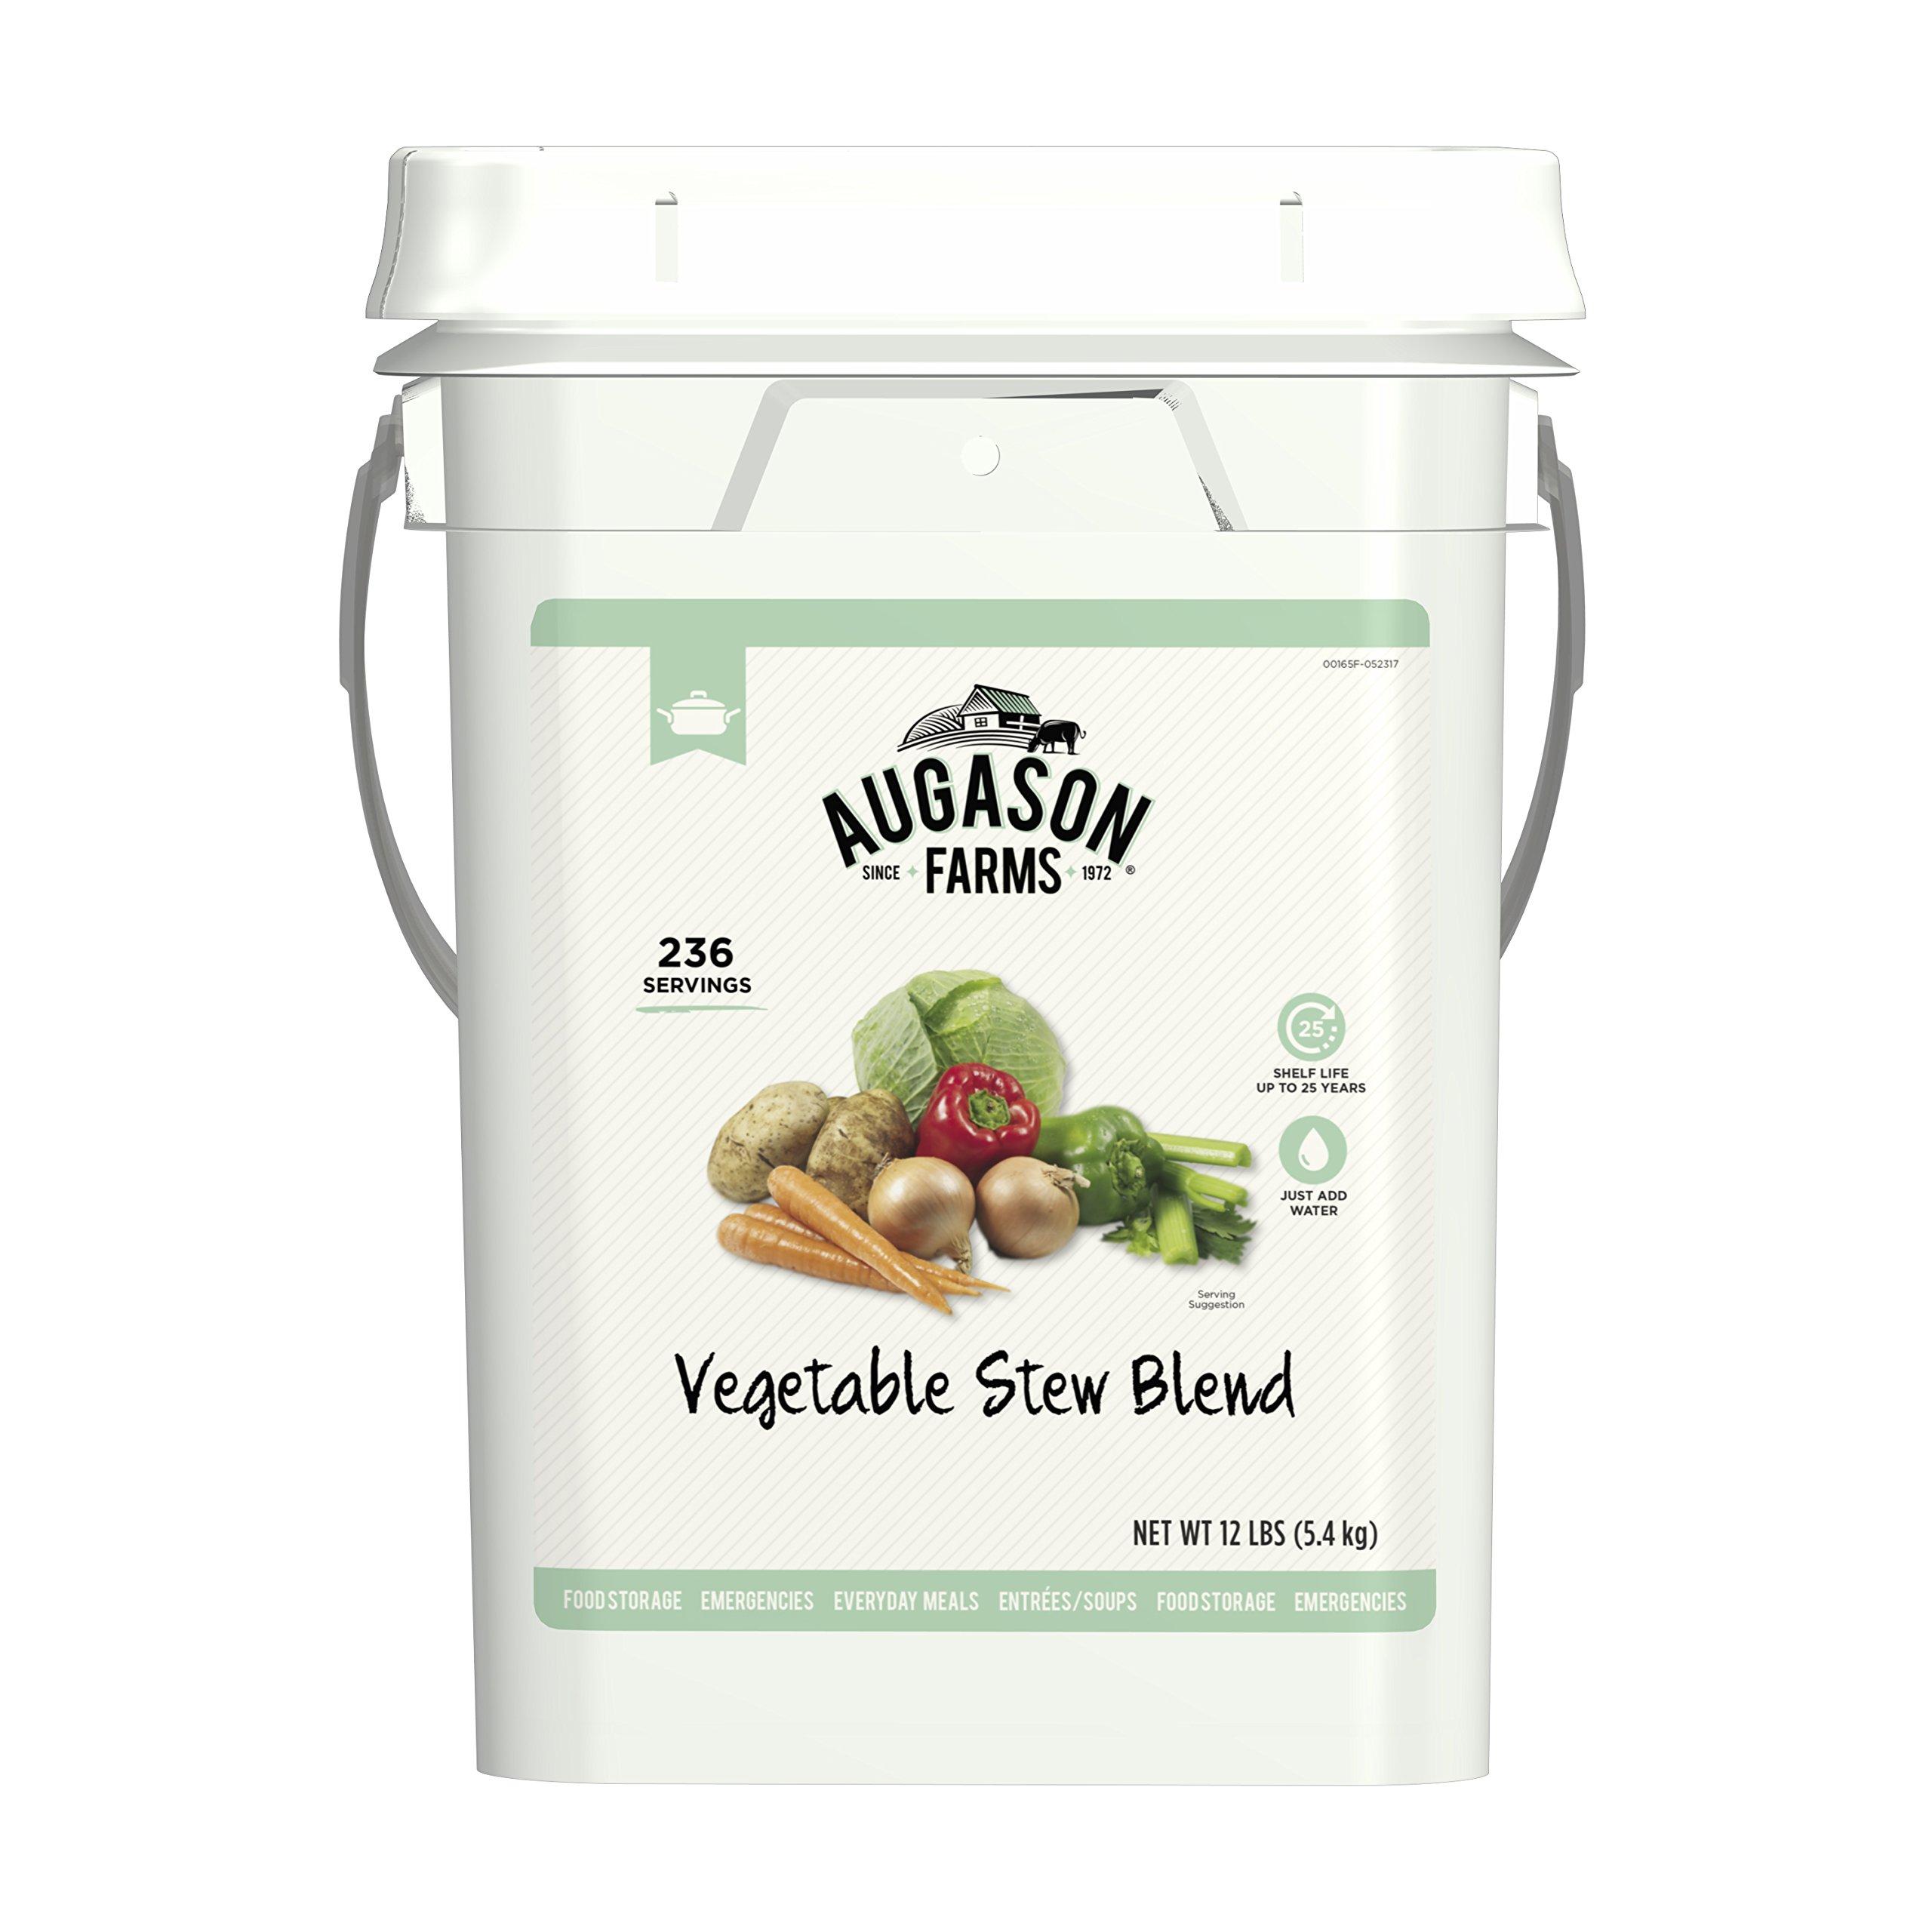 Augason Farms Vegetable Stew Blend Certified Gluten Free by Augason Farms